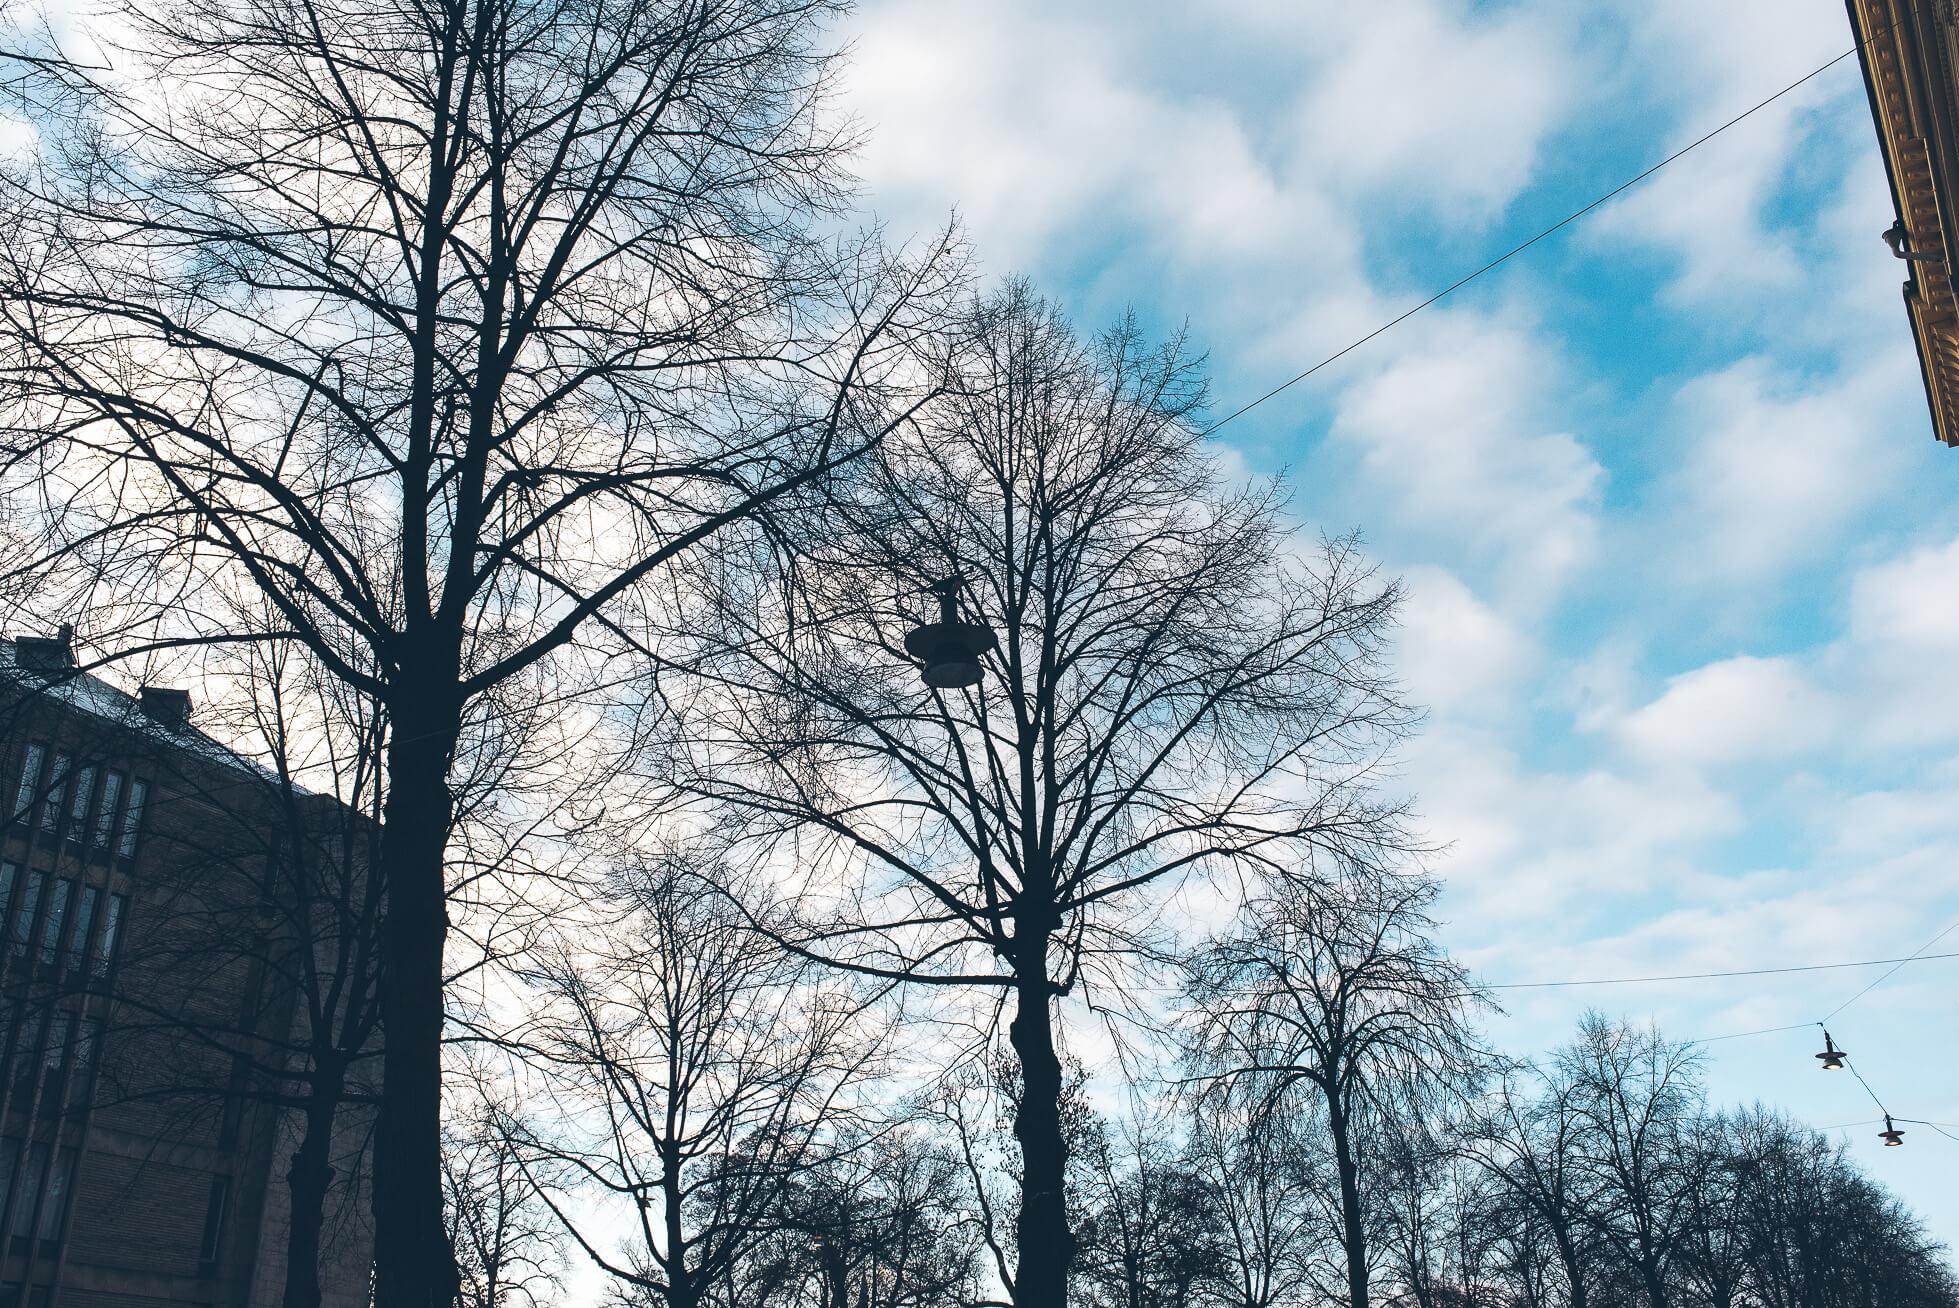 janni-deler-stockholm-snapshotsDSC_6665